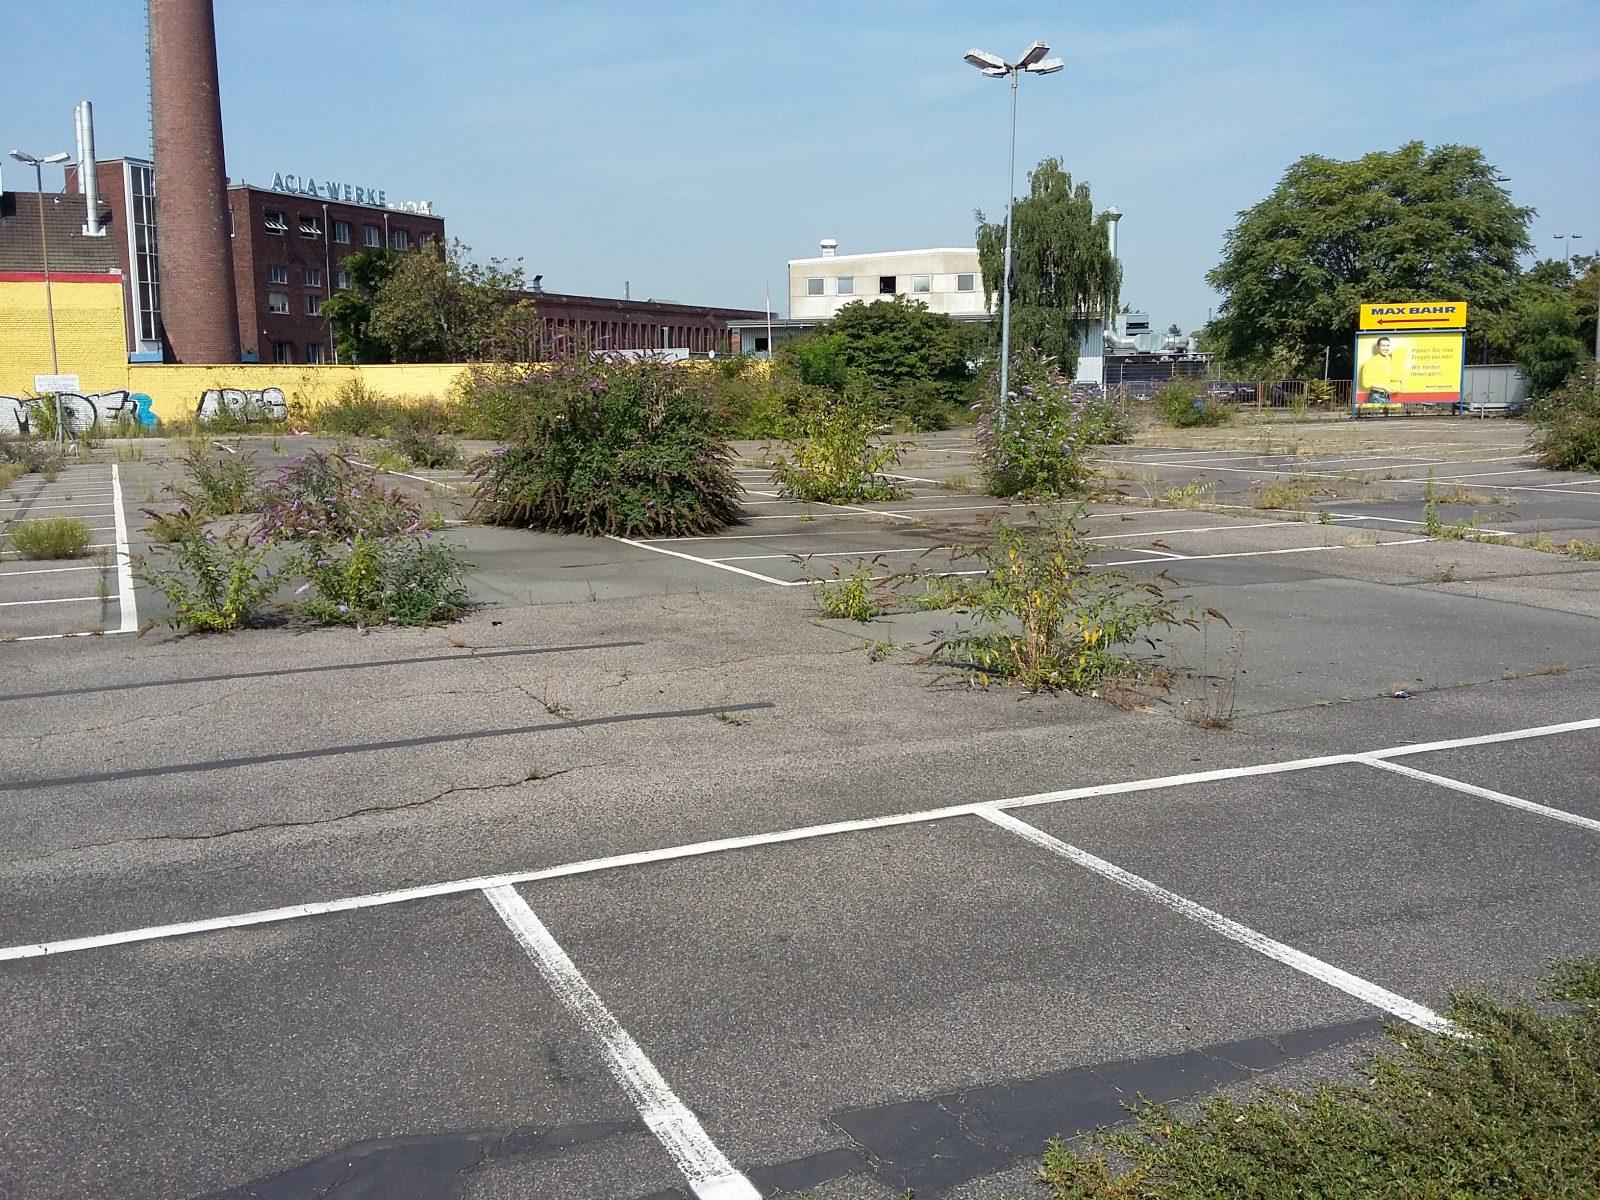 Servicepionier_Servicekomplize_Armin_Nagel_Orte_des_Grauens_Parkplatz (24)